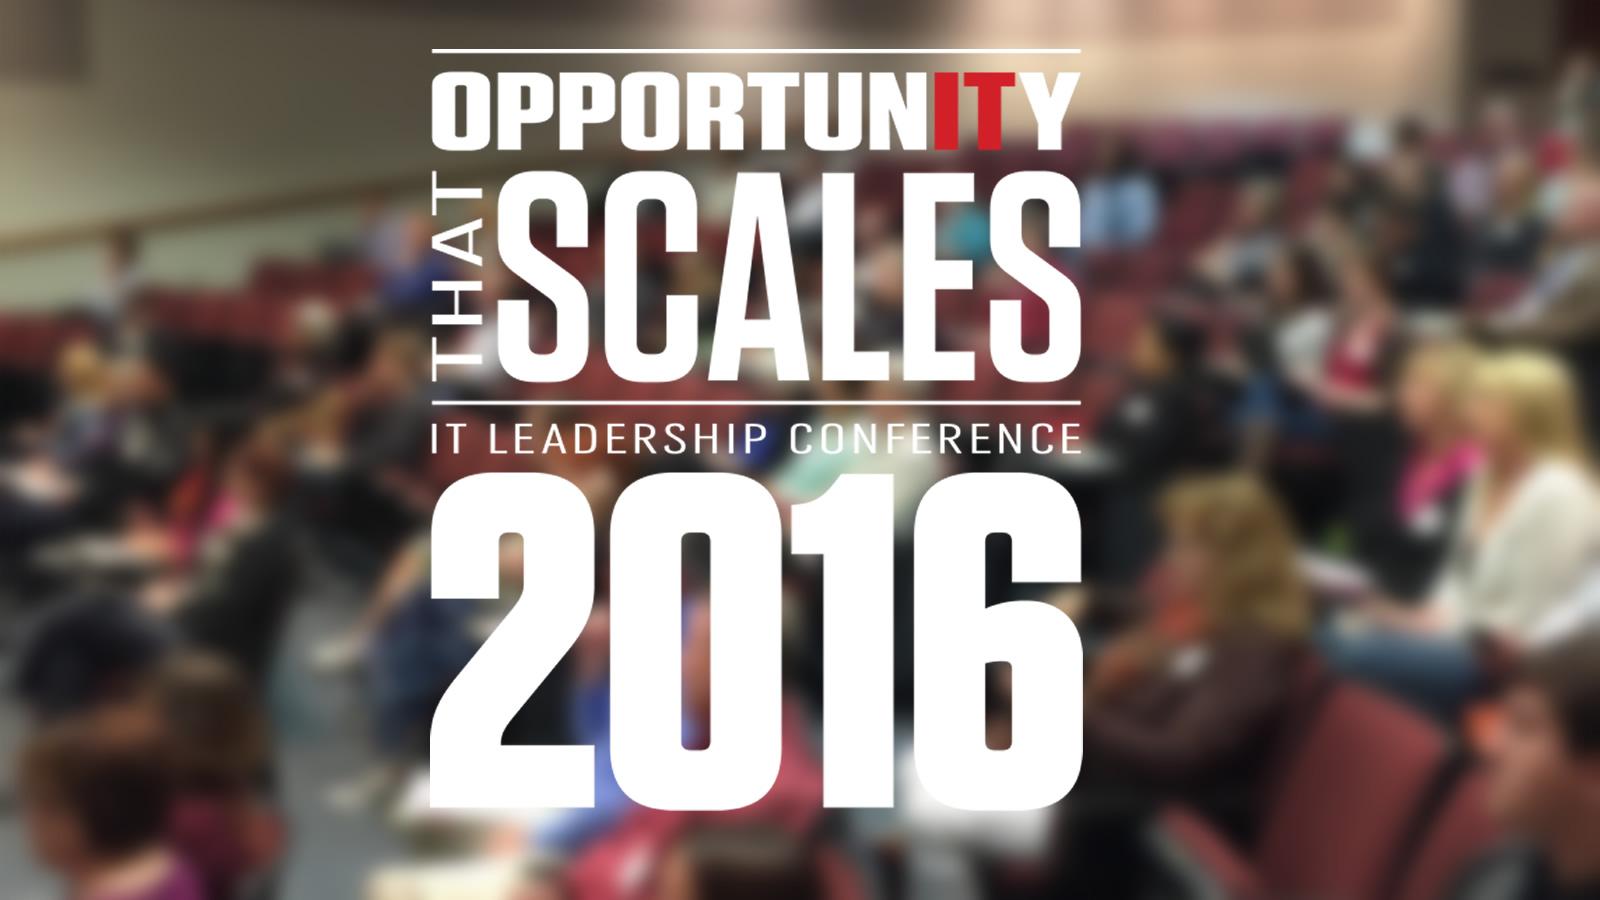 Register at http://its.unl.edu/conference